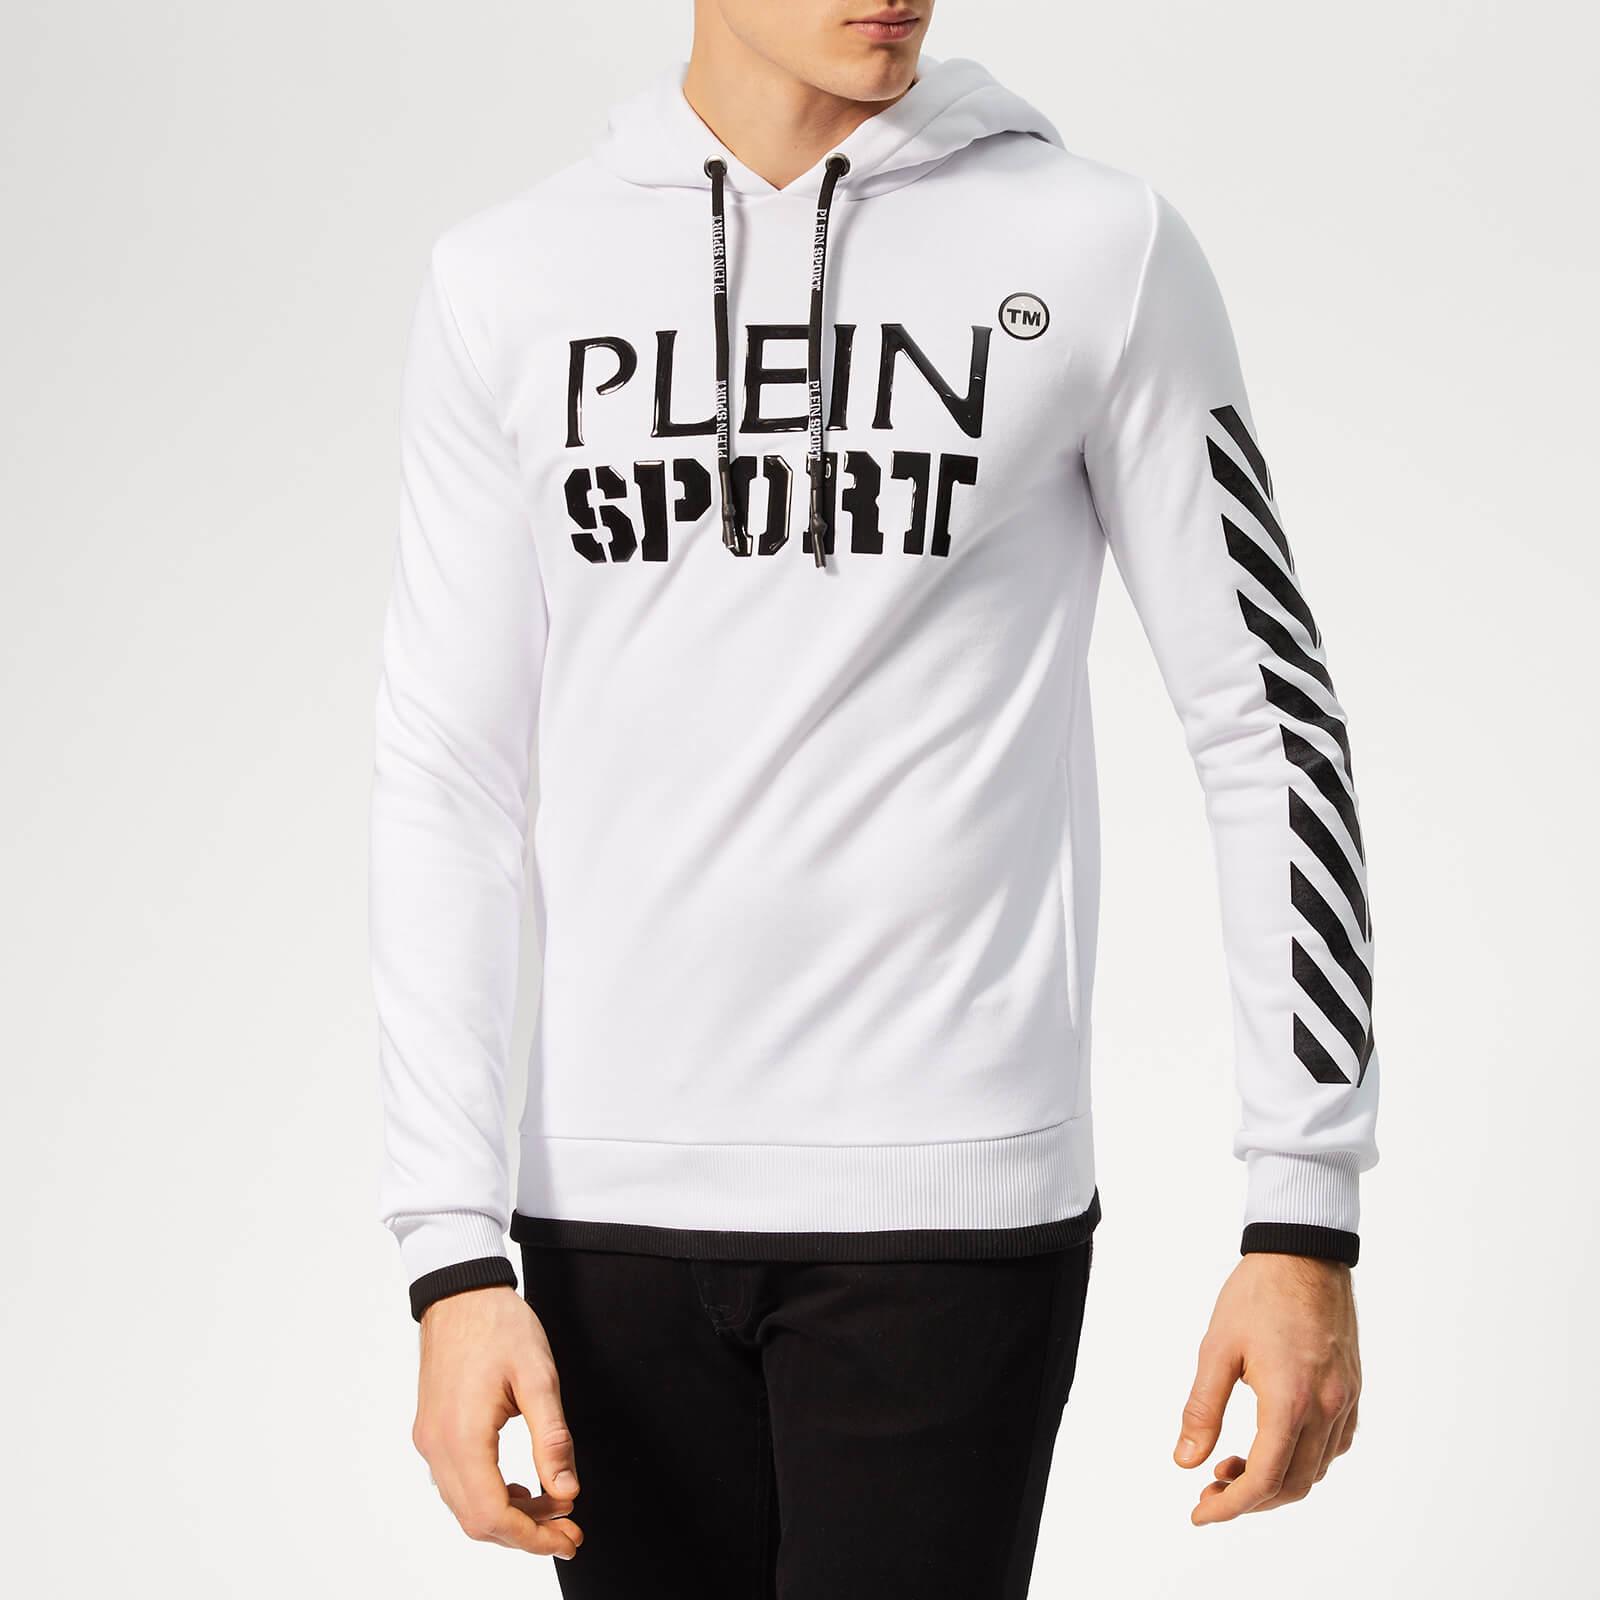 Plein Sport Men's Geometric Stripes Hooded Sweatshirt - White - XXL - White